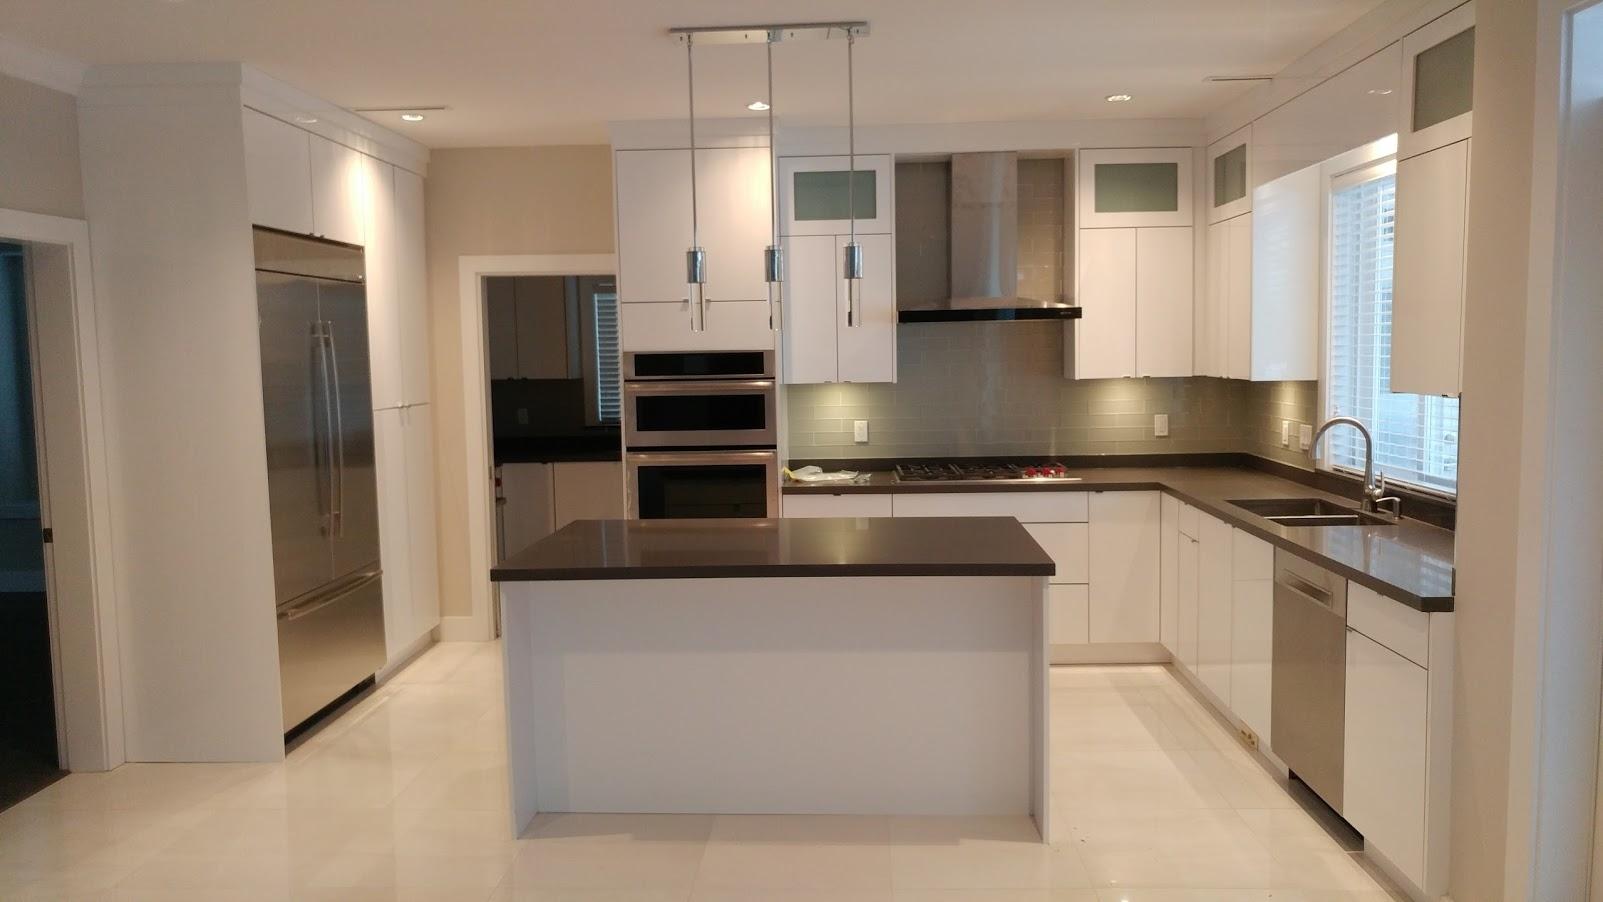 Woodpecker Kitchen Cabinets Ltd - Opening Hours - 215 ...